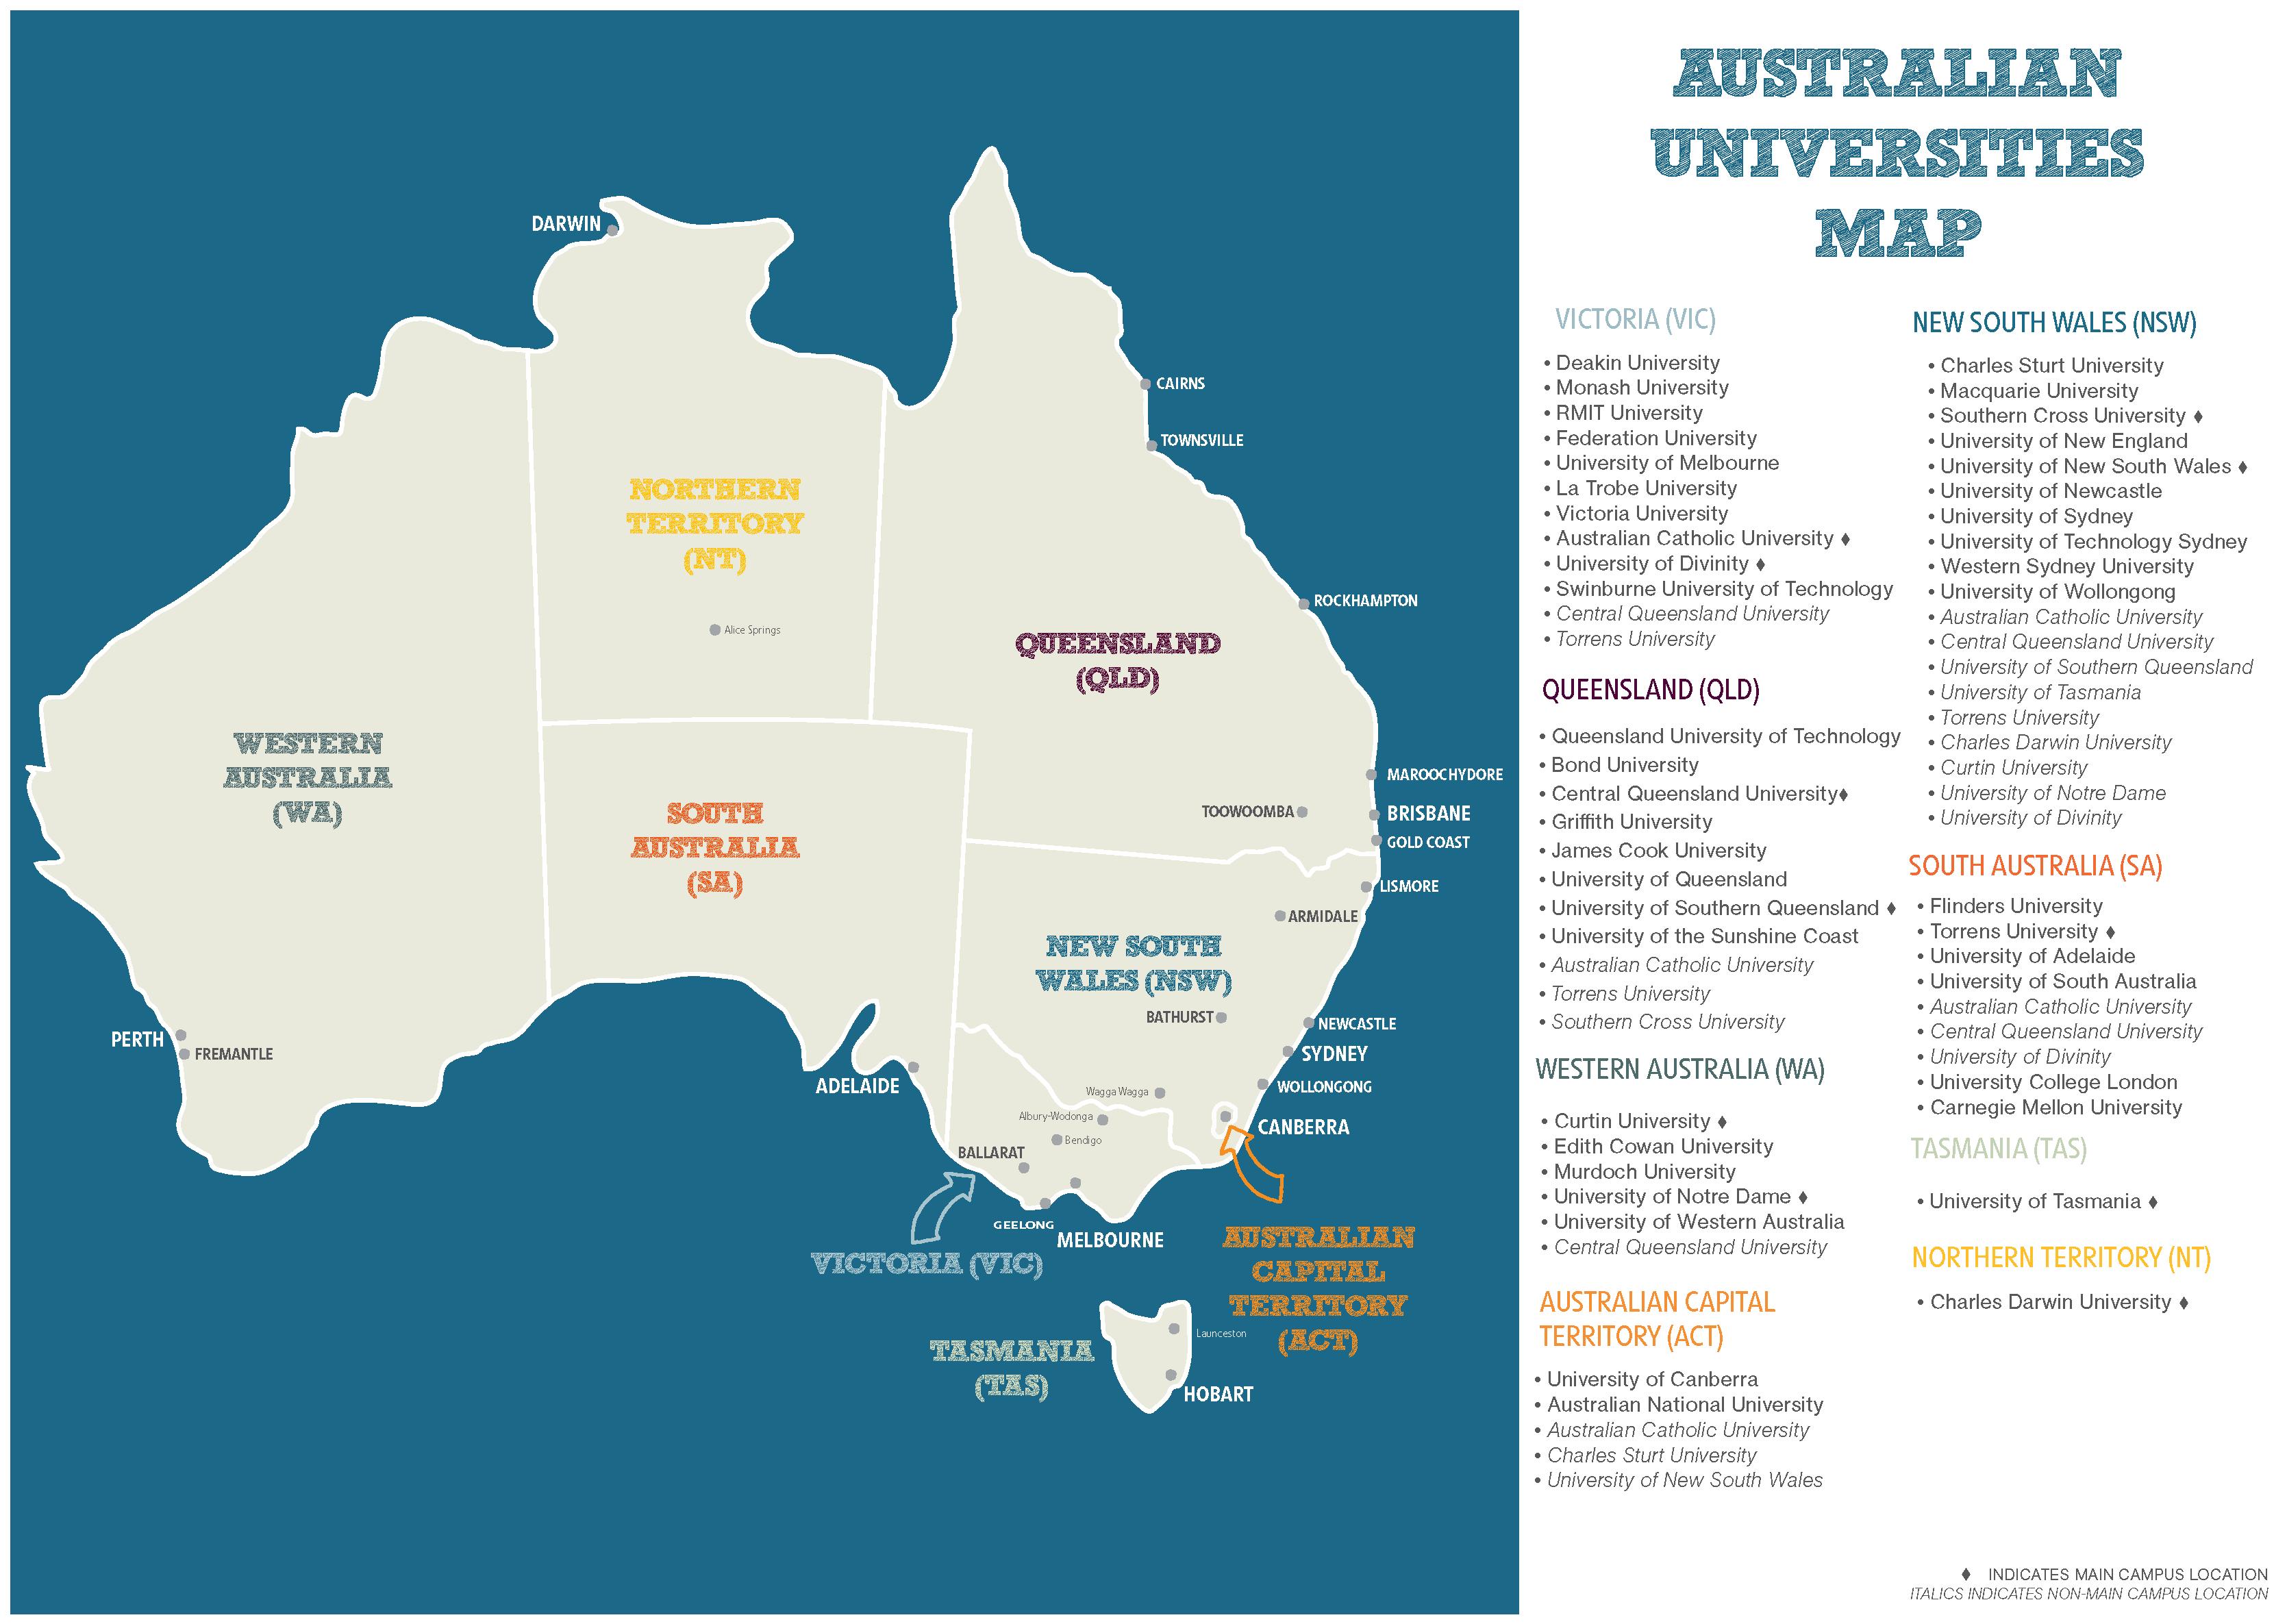 Australian university campuses map